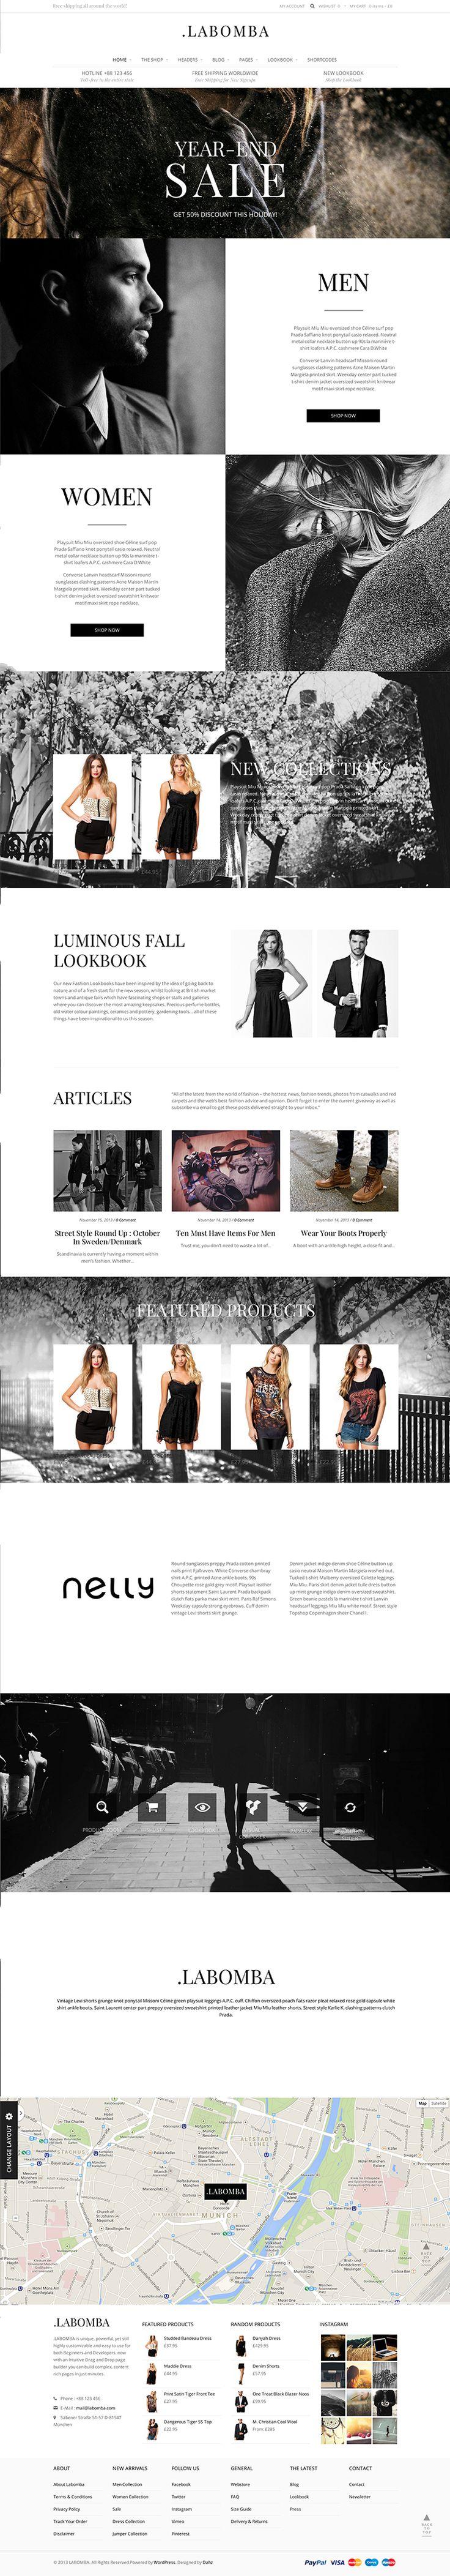 A flat ui design WordPress theme and WooCommerce integration